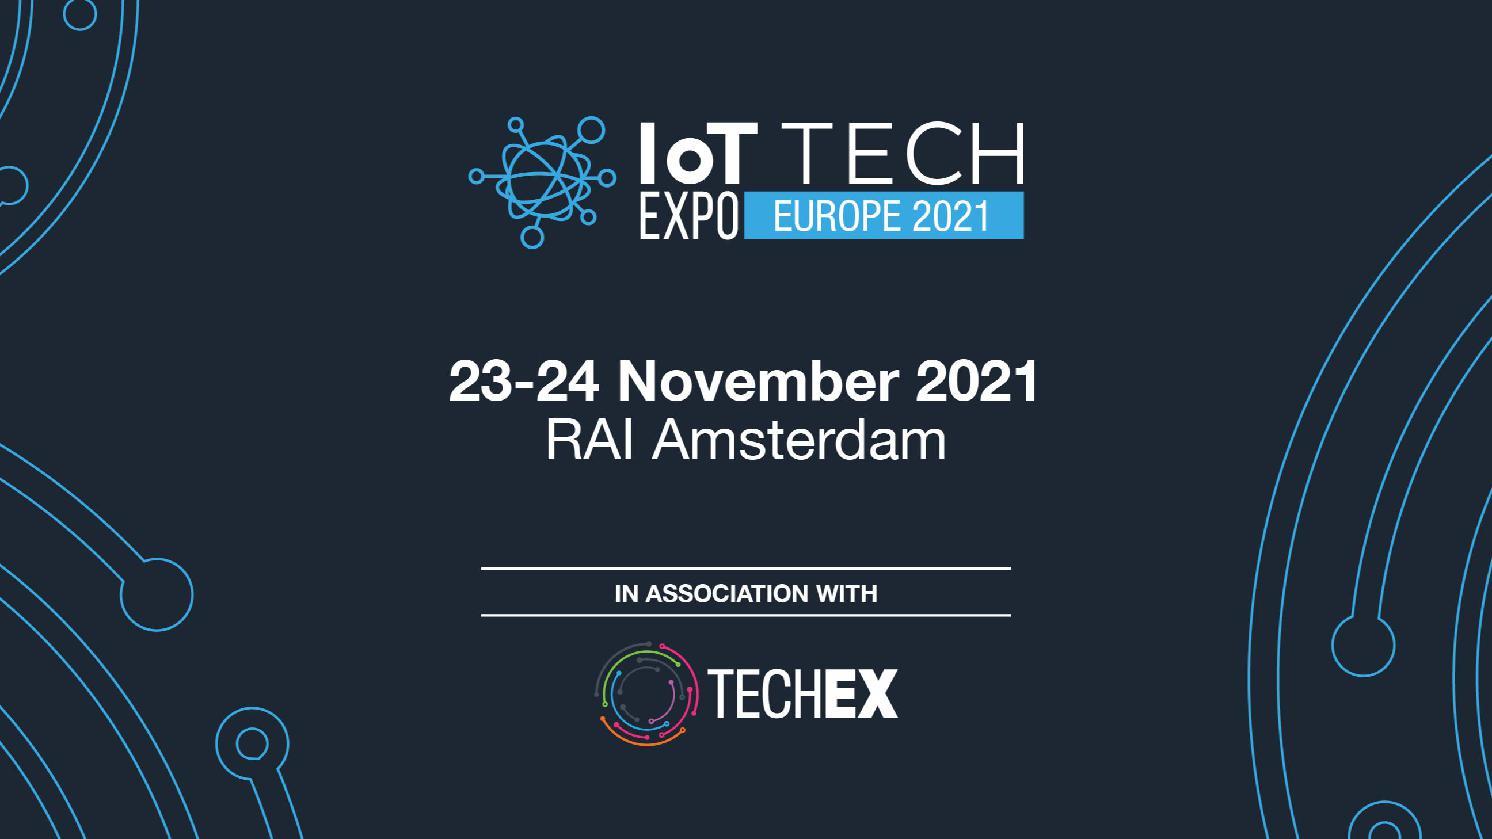 IoT Tech Expo Europe 2021